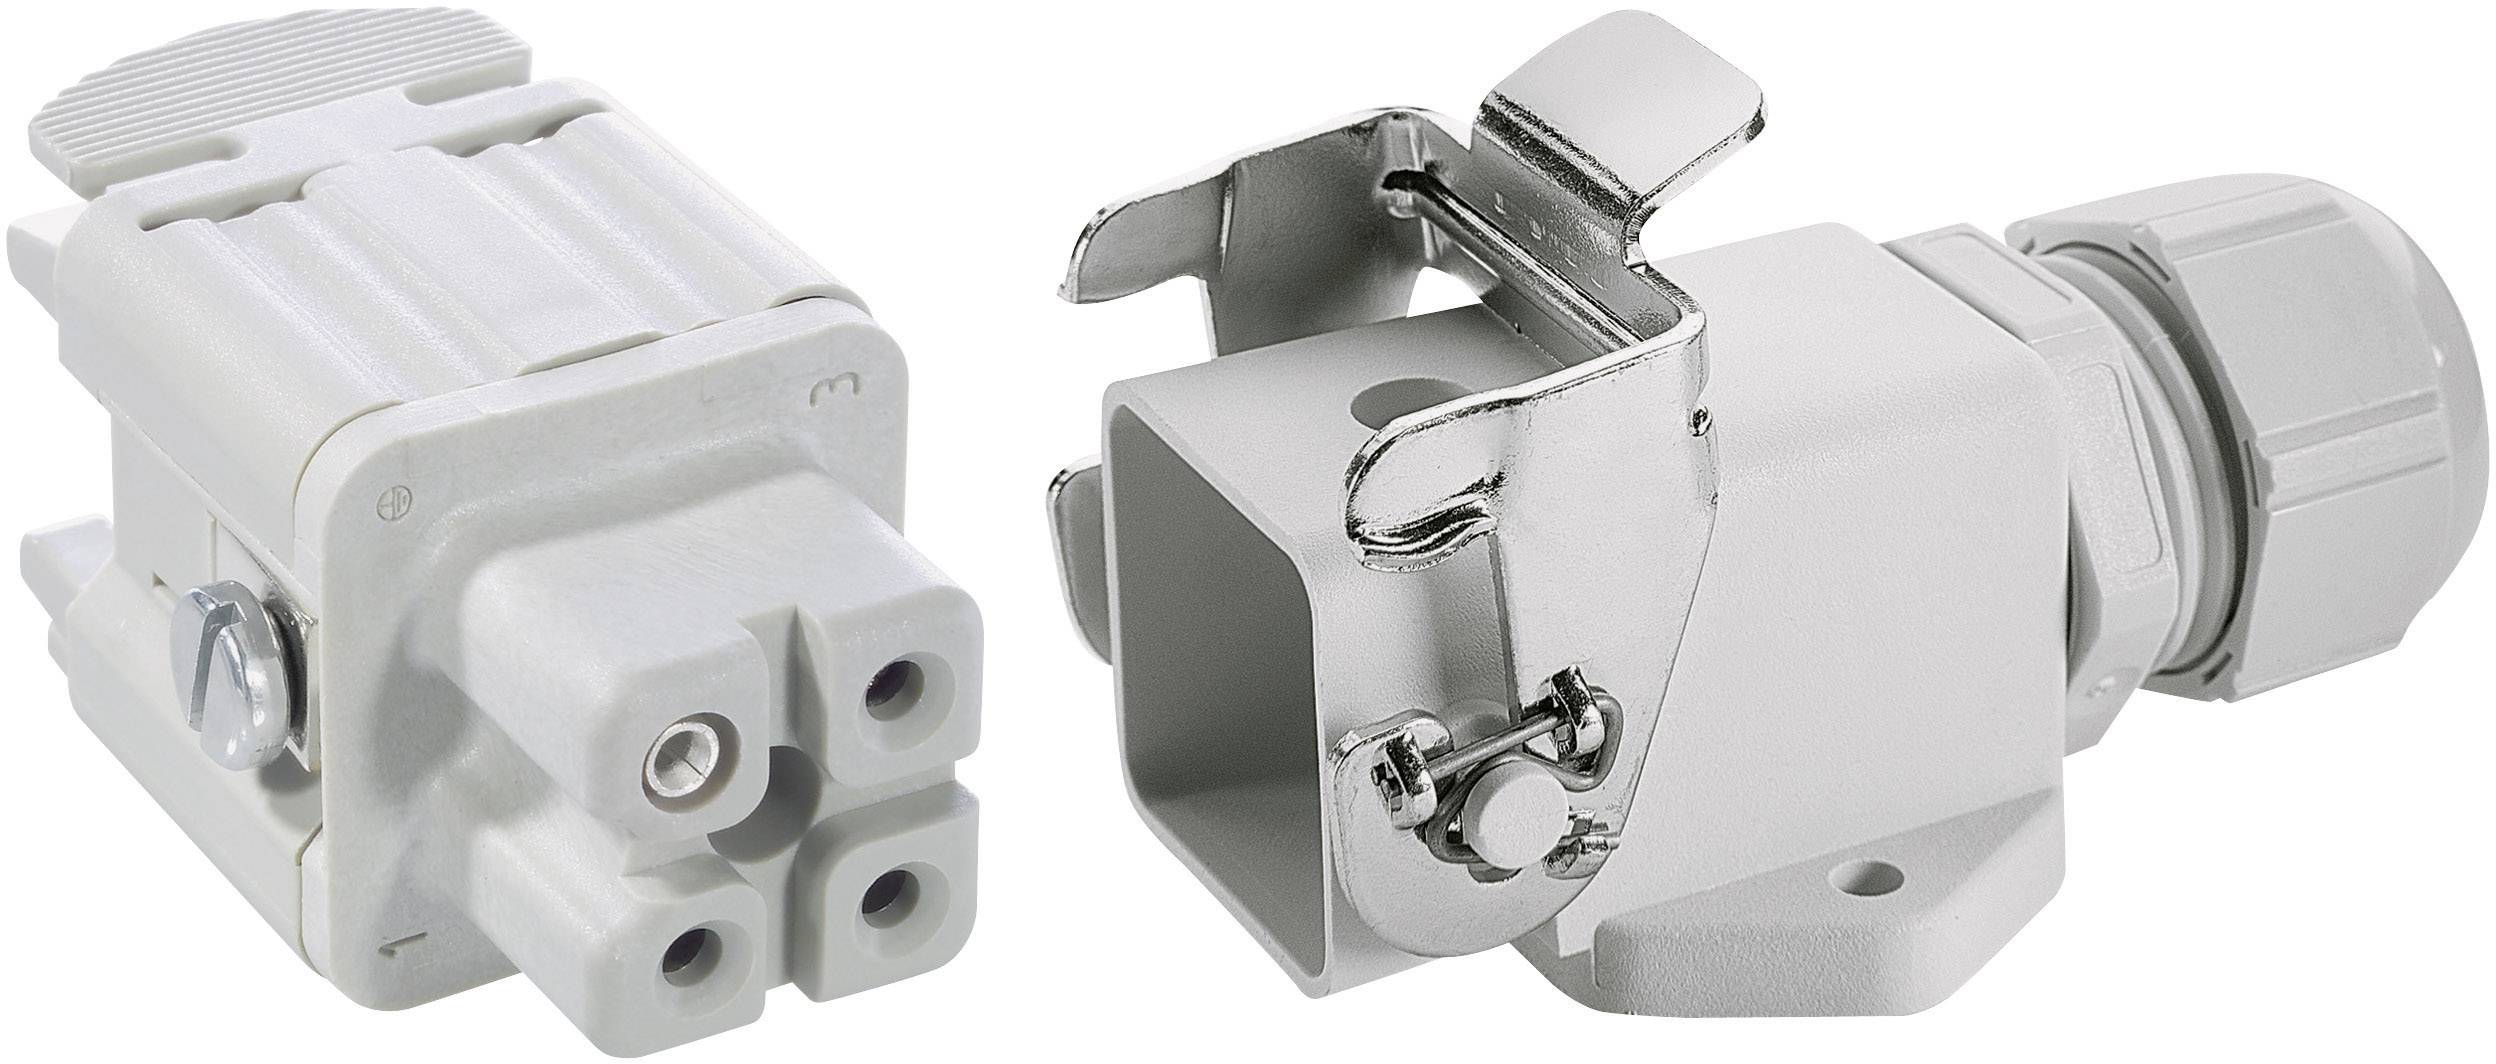 Sada konektoru EPIC®KIT H-A 3 75009609 LAPP 3 + PE šroubovací 1 sada